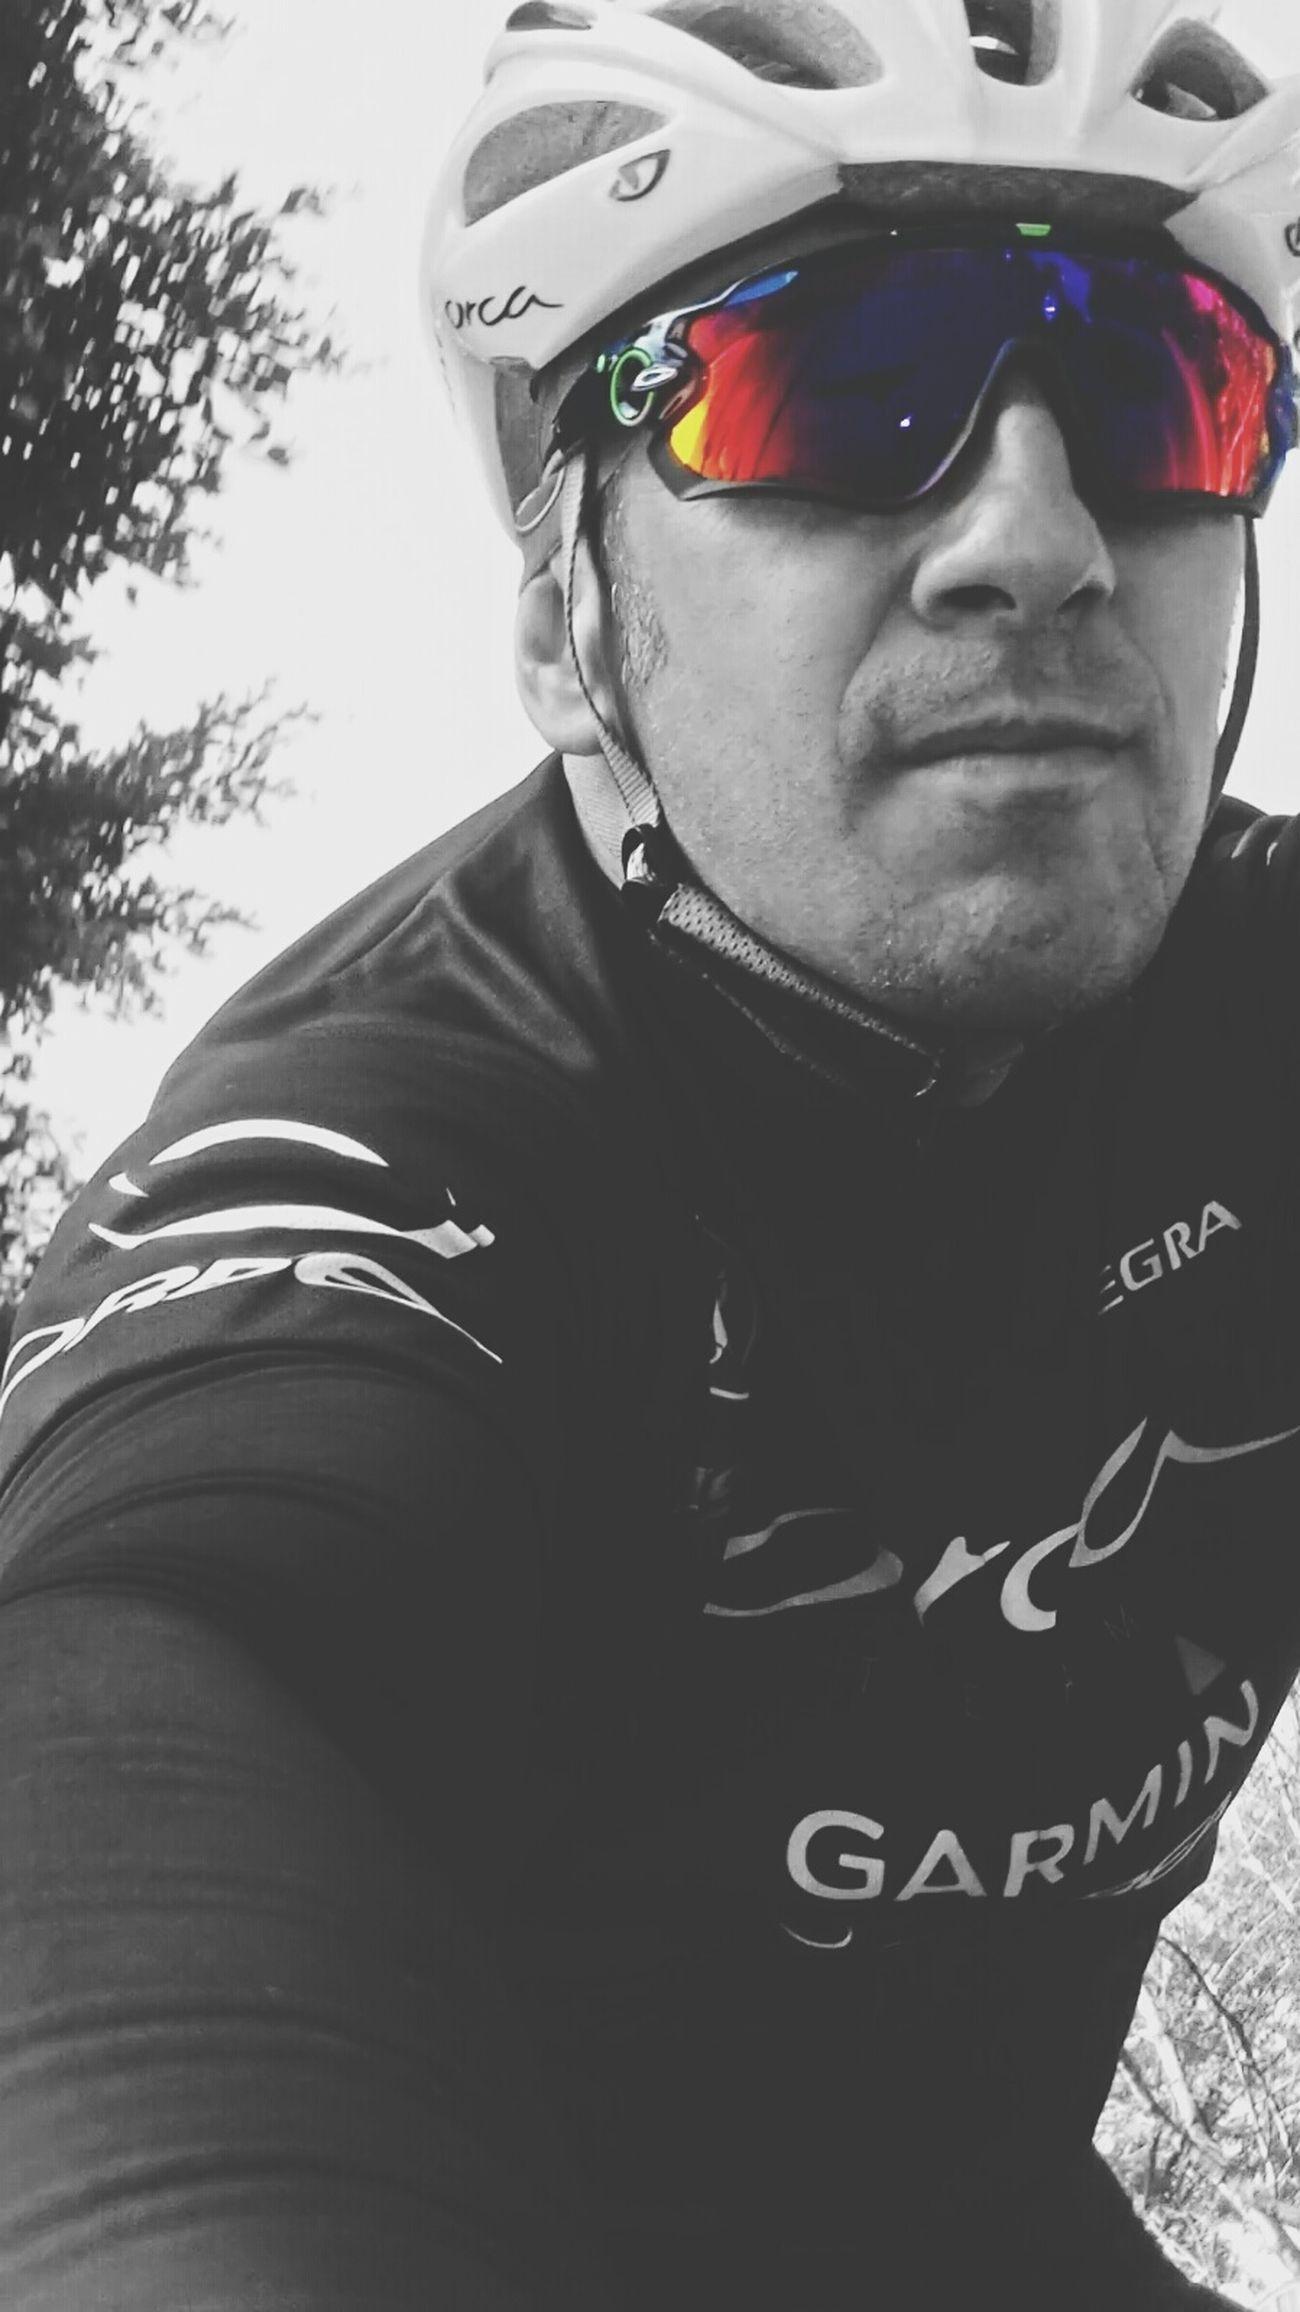 Oakleysunglasses Jawbreaker Excercising Cycling FaceTime Garmin Blackandwhite Enjoying The Sun Selfshot Fashion